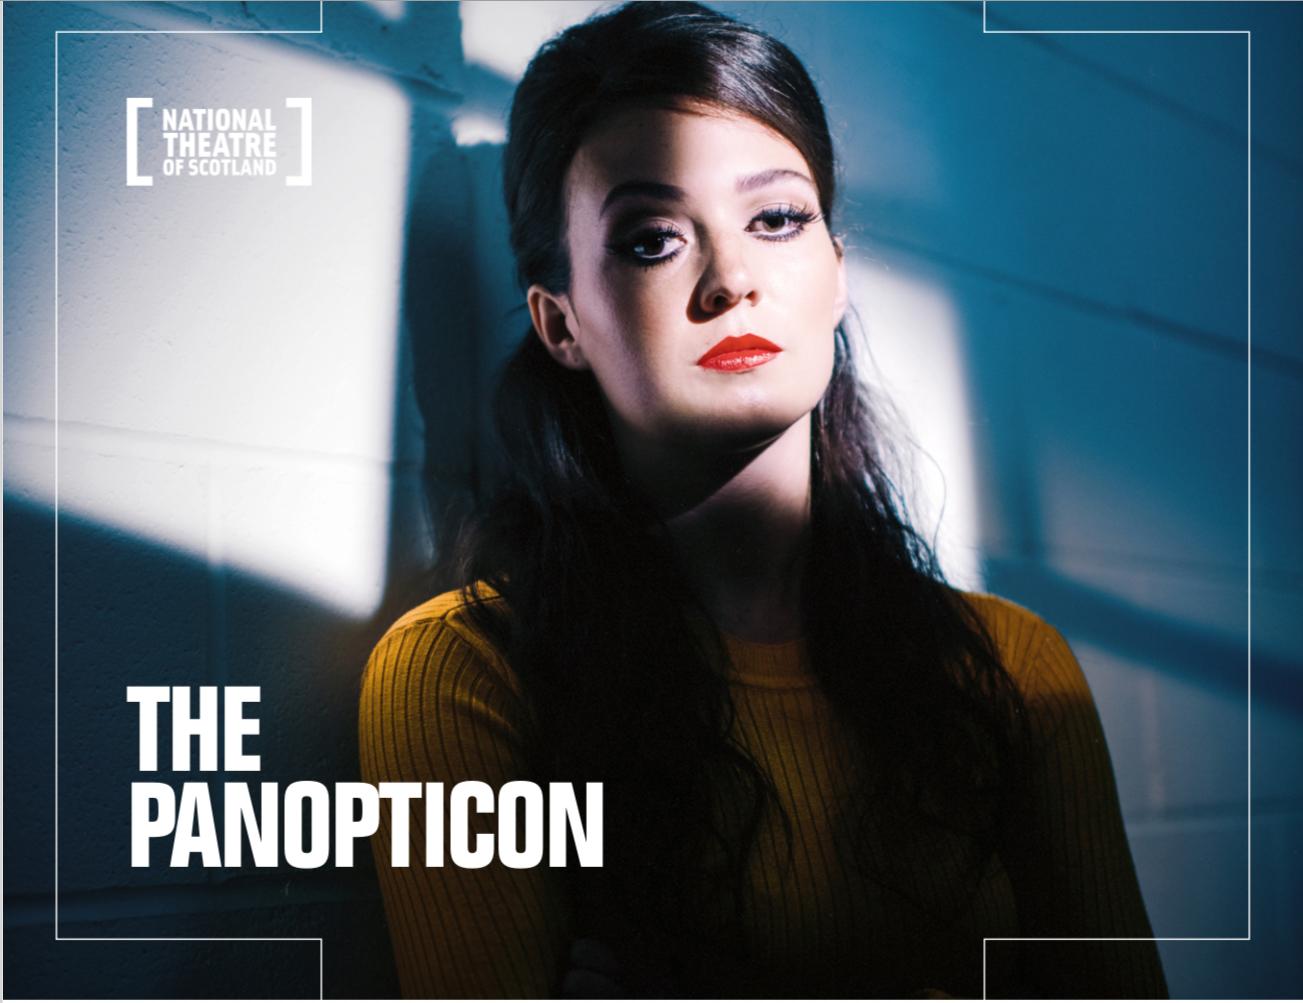 The Panopticon - National Theatre of Scotland